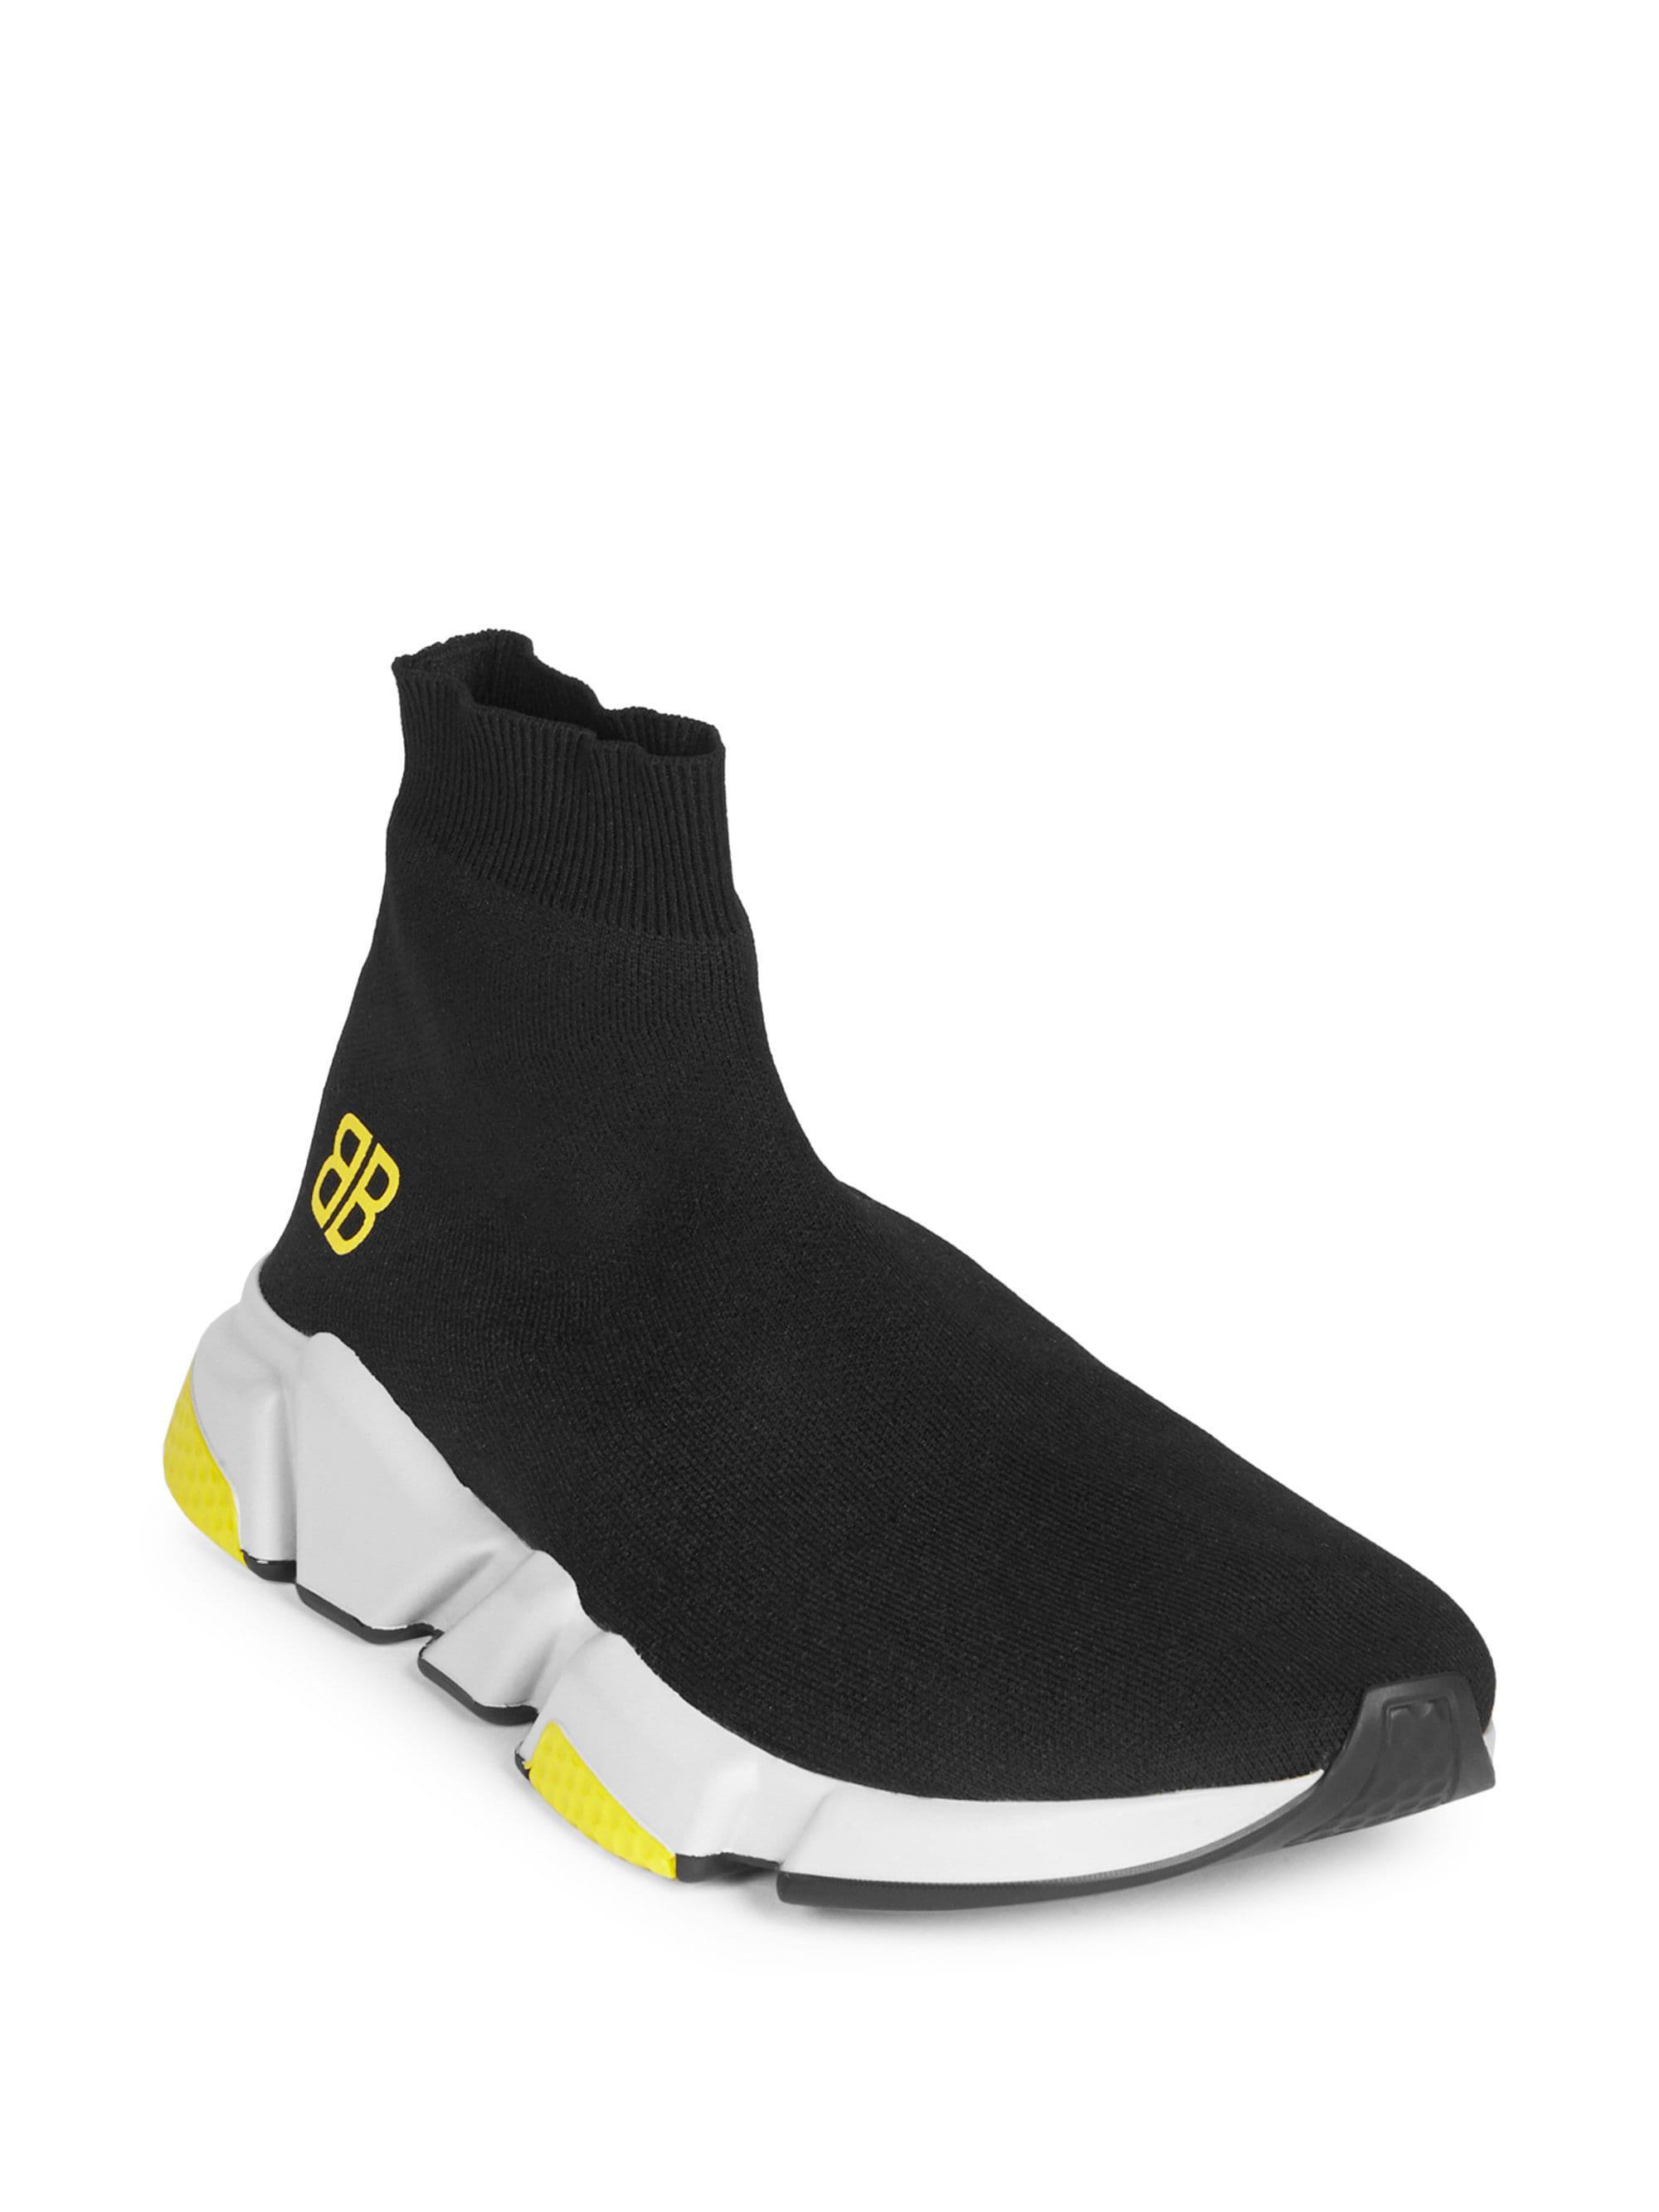 f0535e83b16f Balenciaga Speed Trainer Sock Sneakers in Black for Men - Lyst